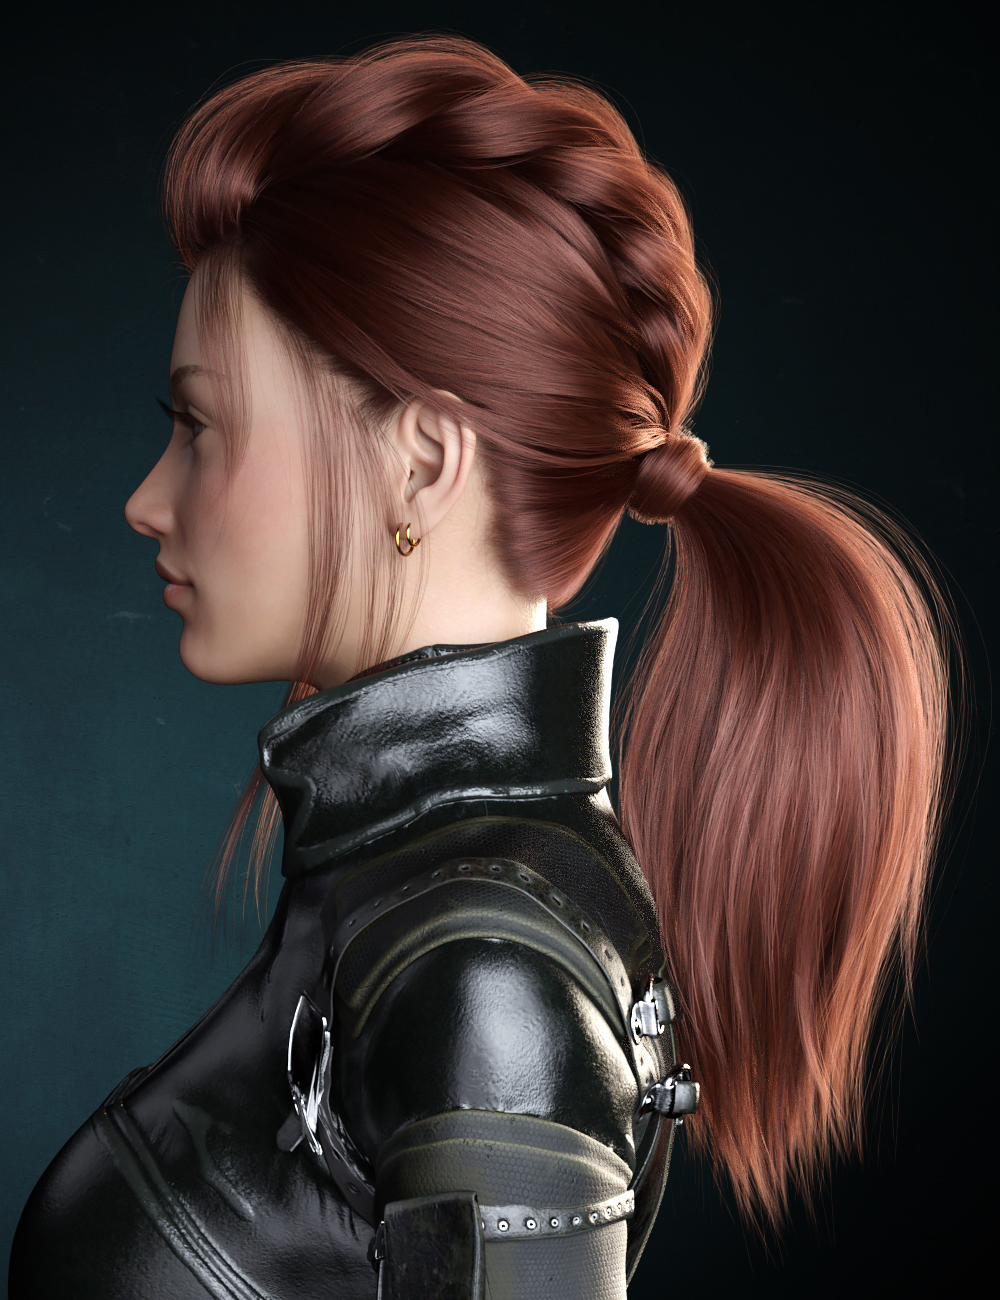 Kelly Hair for Genesis 8 Female(s) by: WindField, 3D Models by Daz 3D